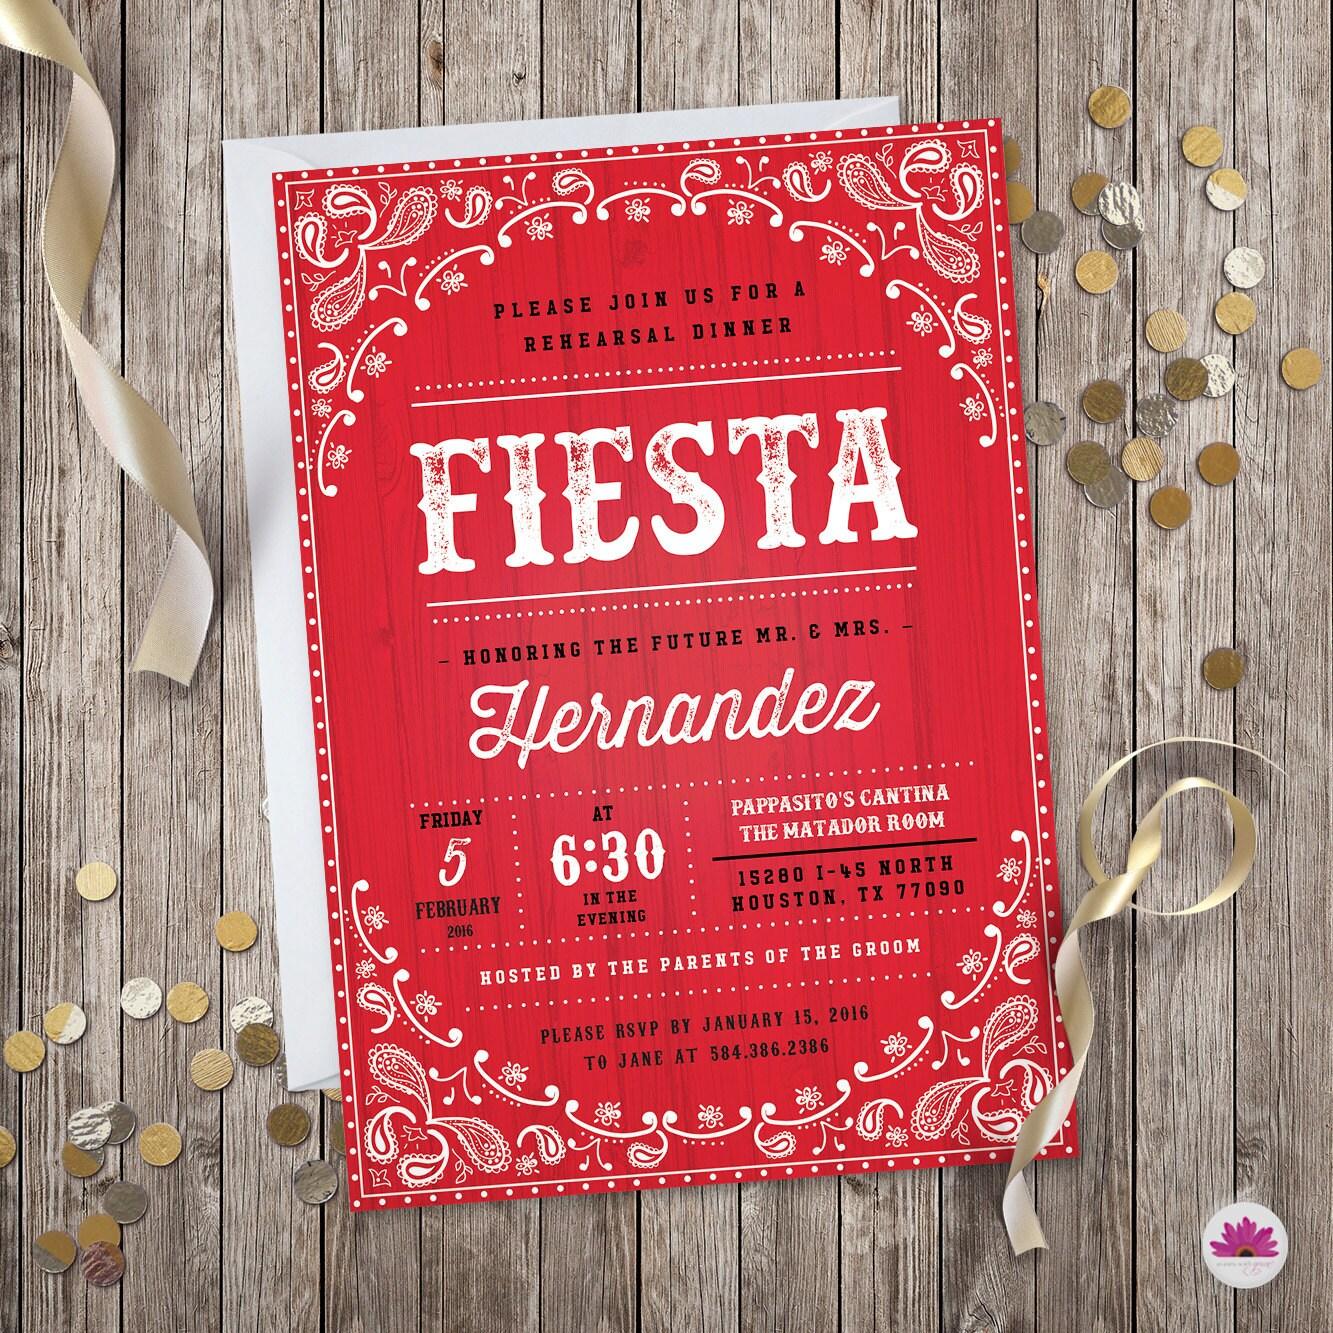 Fiesta Rehearsal Dinner Invitation Bandana Theme Digital | Etsy